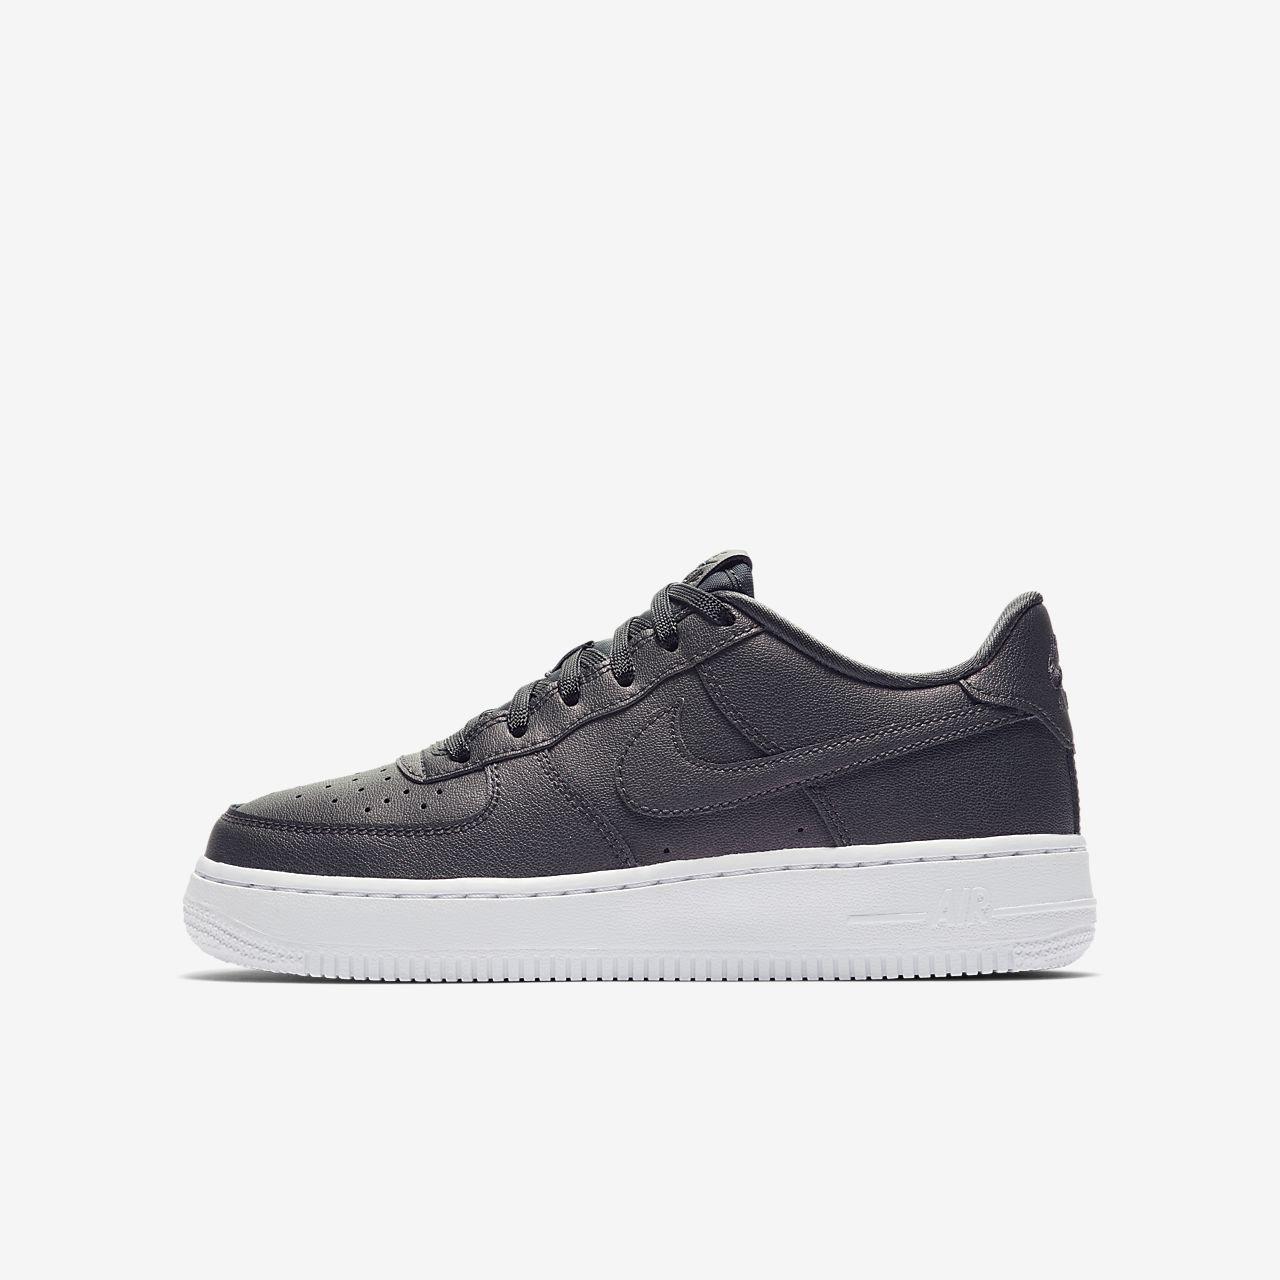 the best attitude e9b72 1305d ... Nike Air Force 1 SS Older Kids Shoe